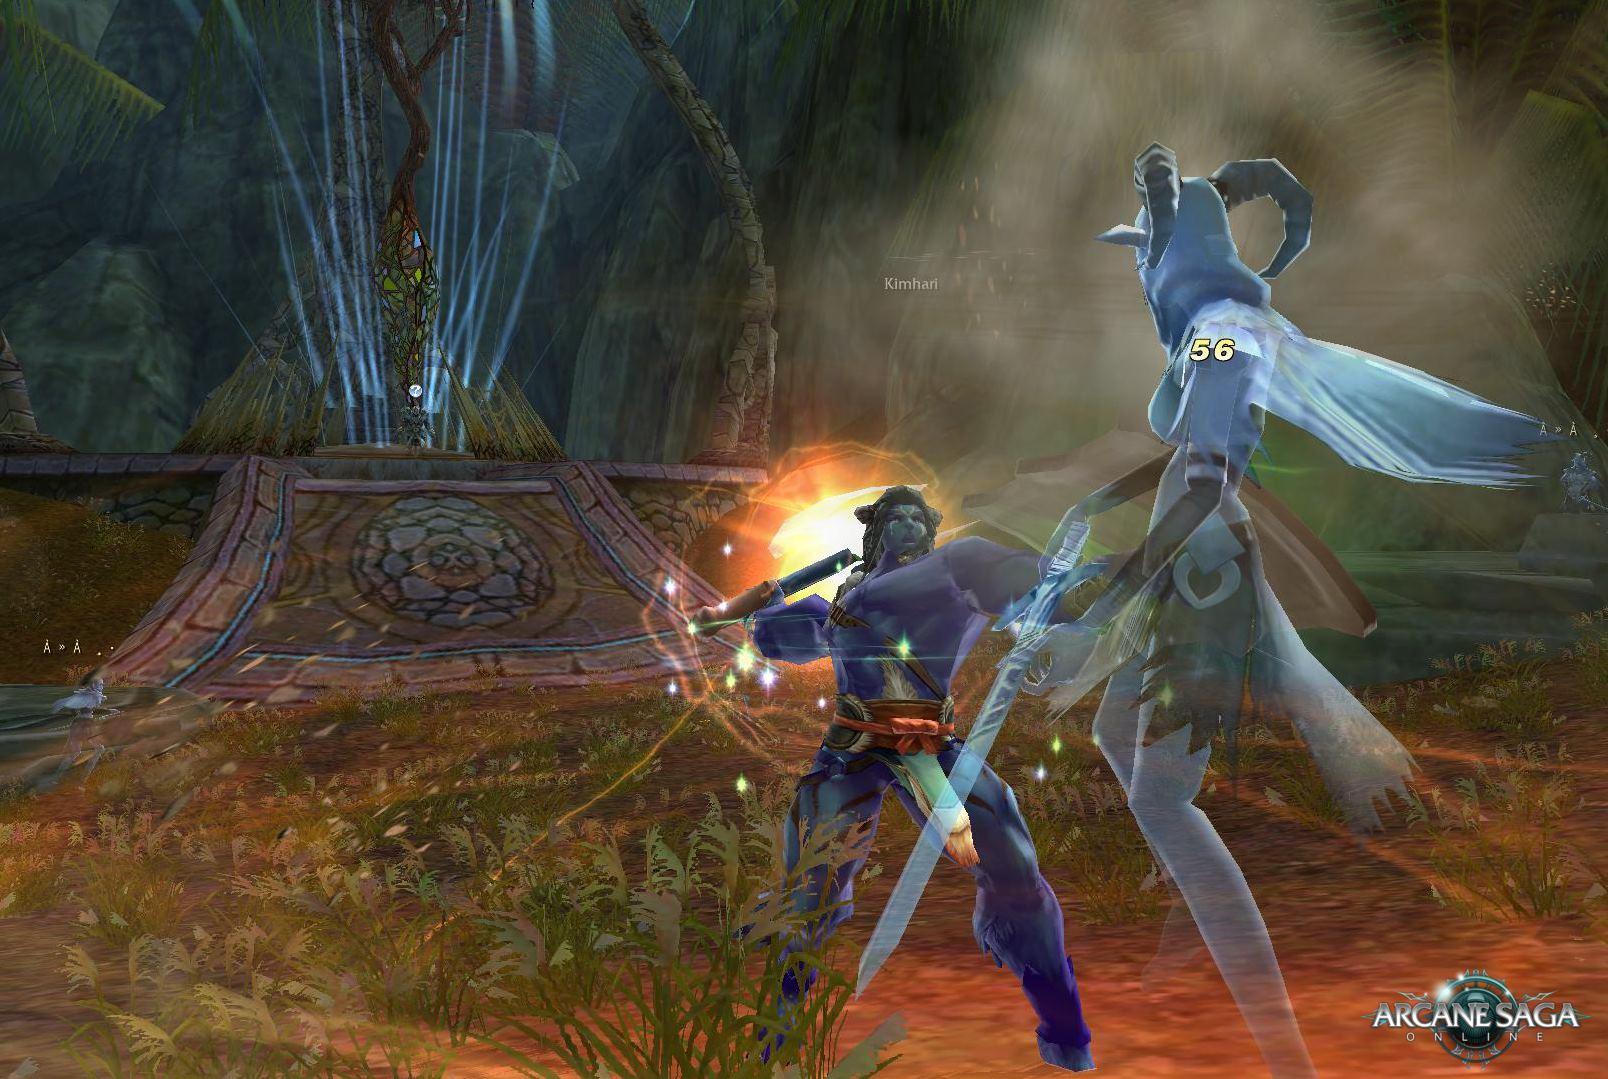 Arcane-Saga-screenshot-1